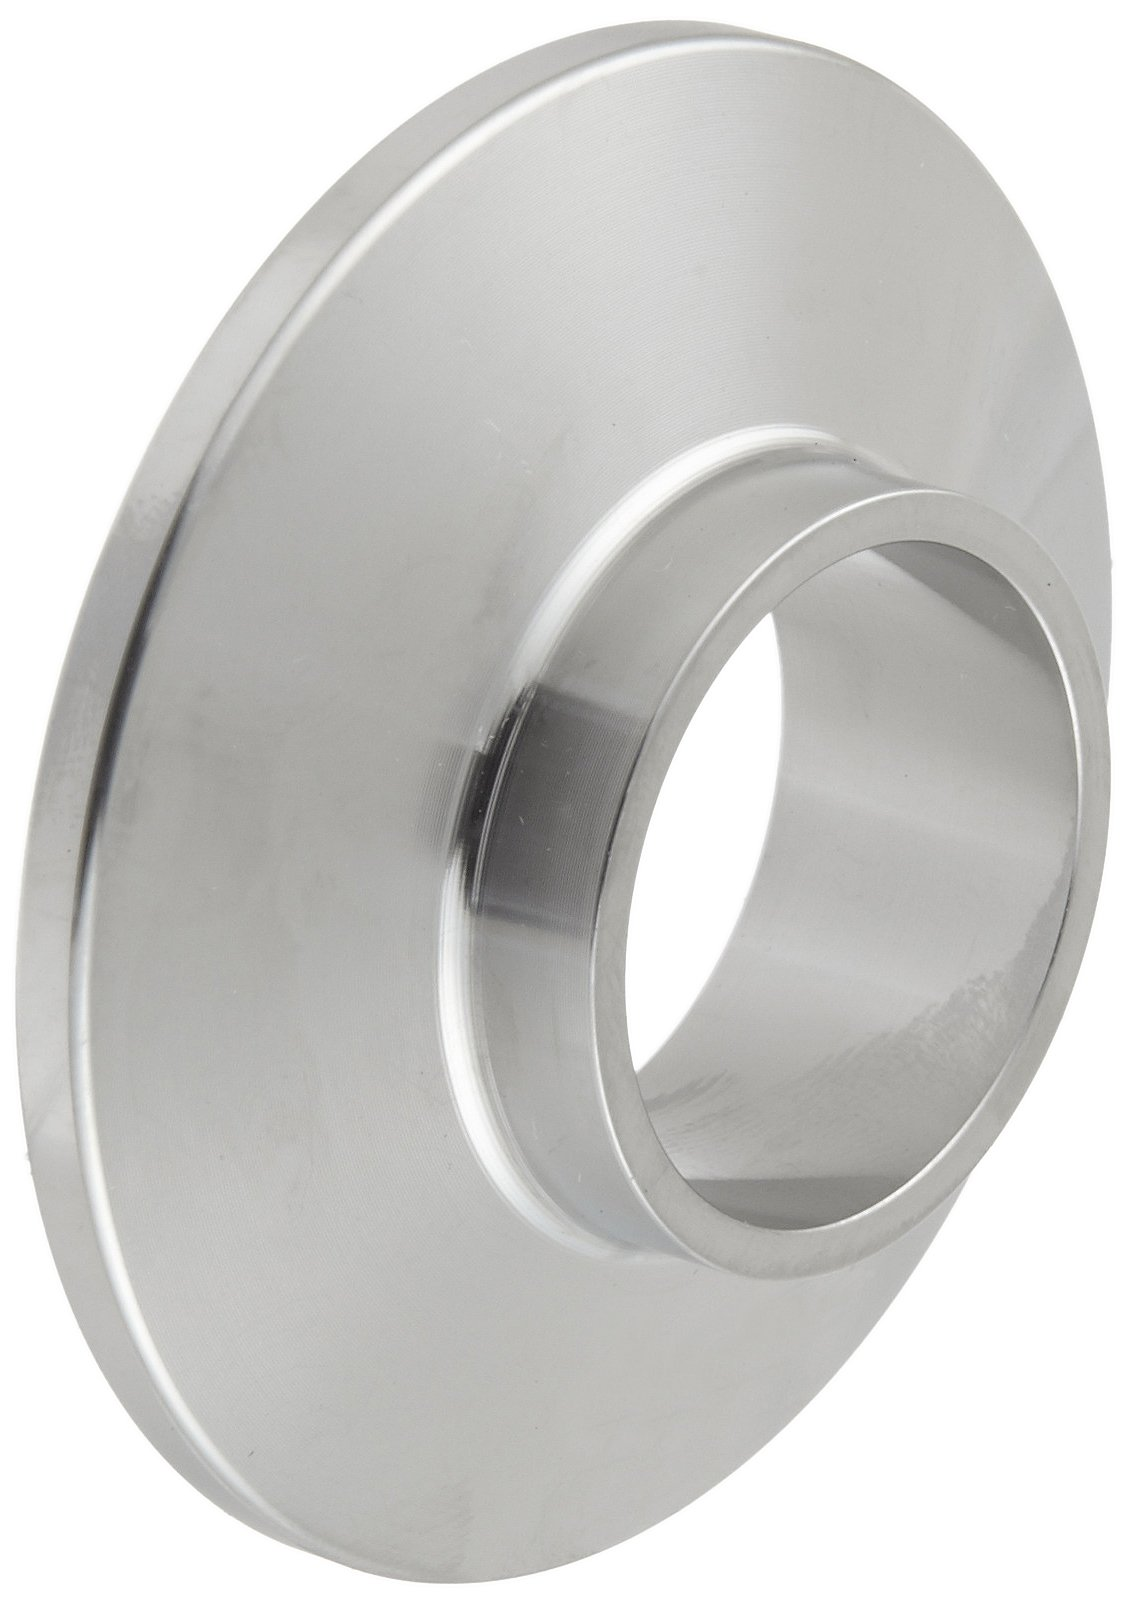 Dixon 14WMP-R100 Stainless Steel 316L Sanitary Fitting, Short Weld Clamp Ferrule, 1'' Tube OD